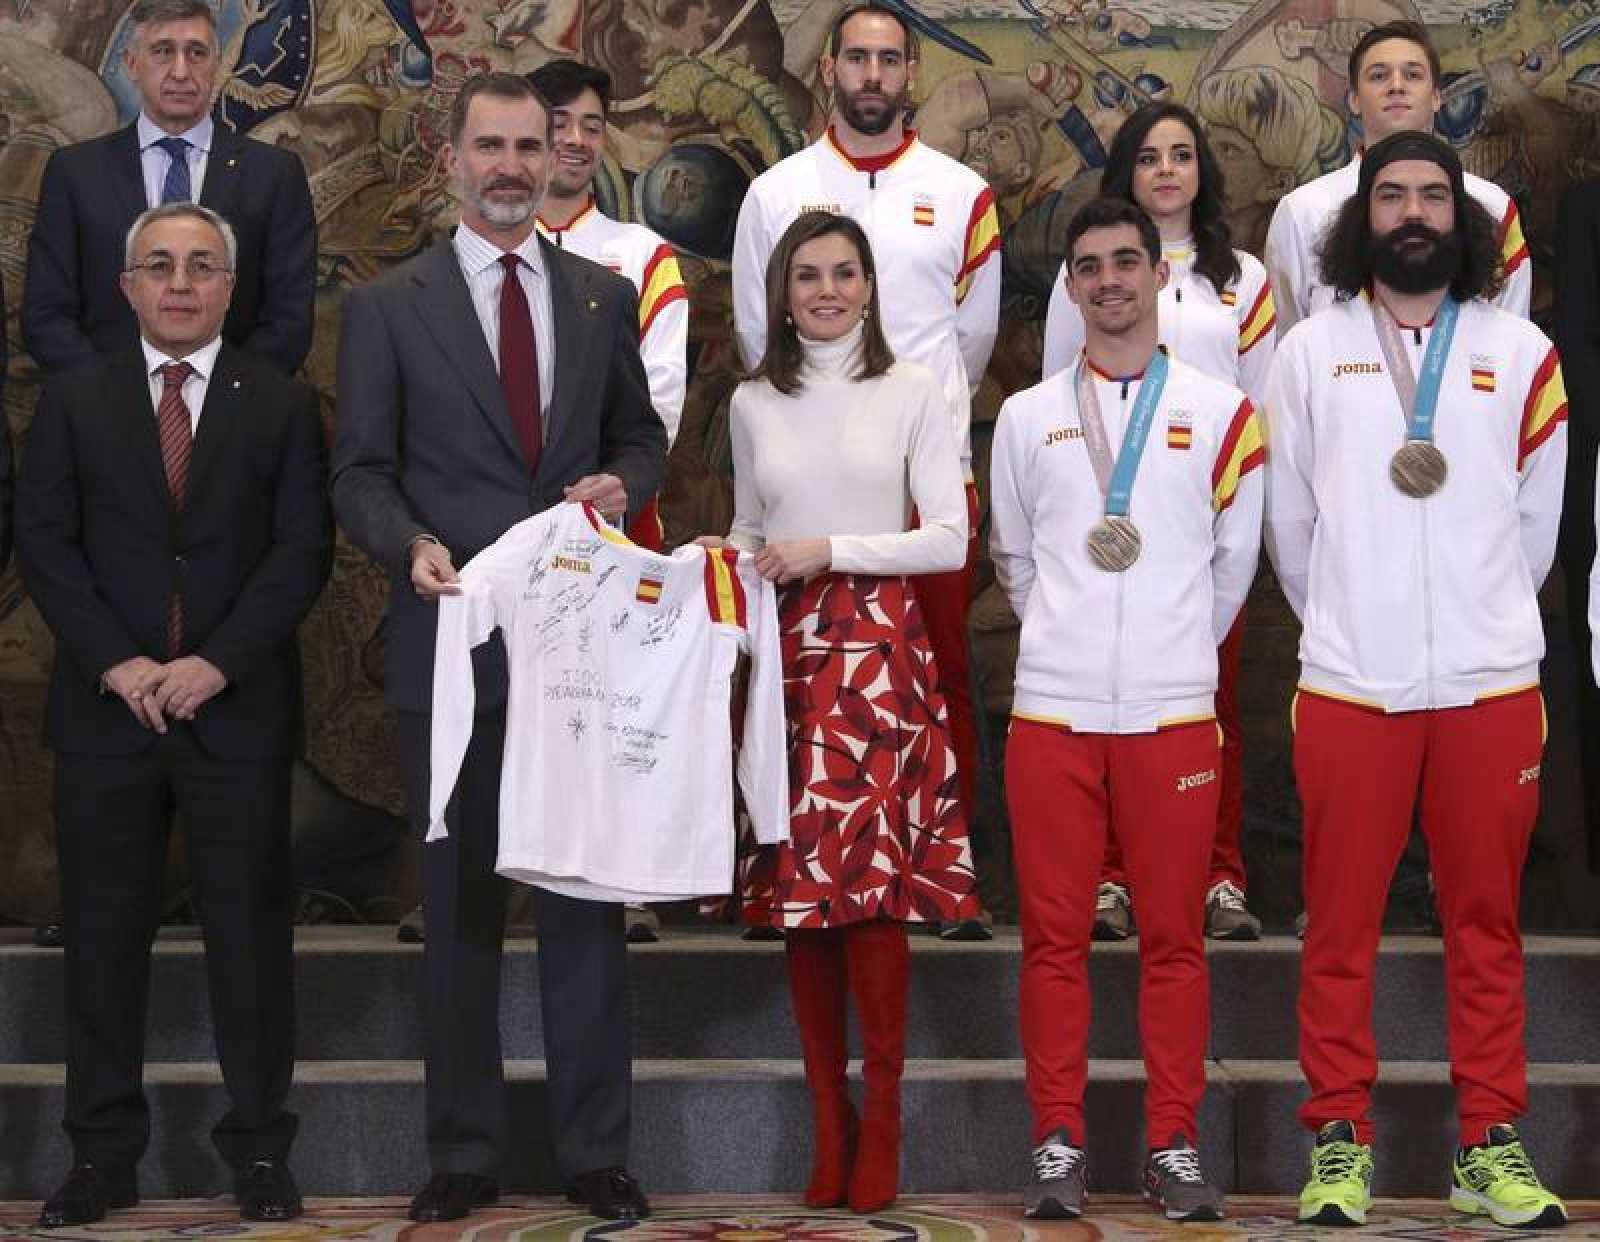 Reyes reciben al equipo olímpico español participante en Pyeongchang